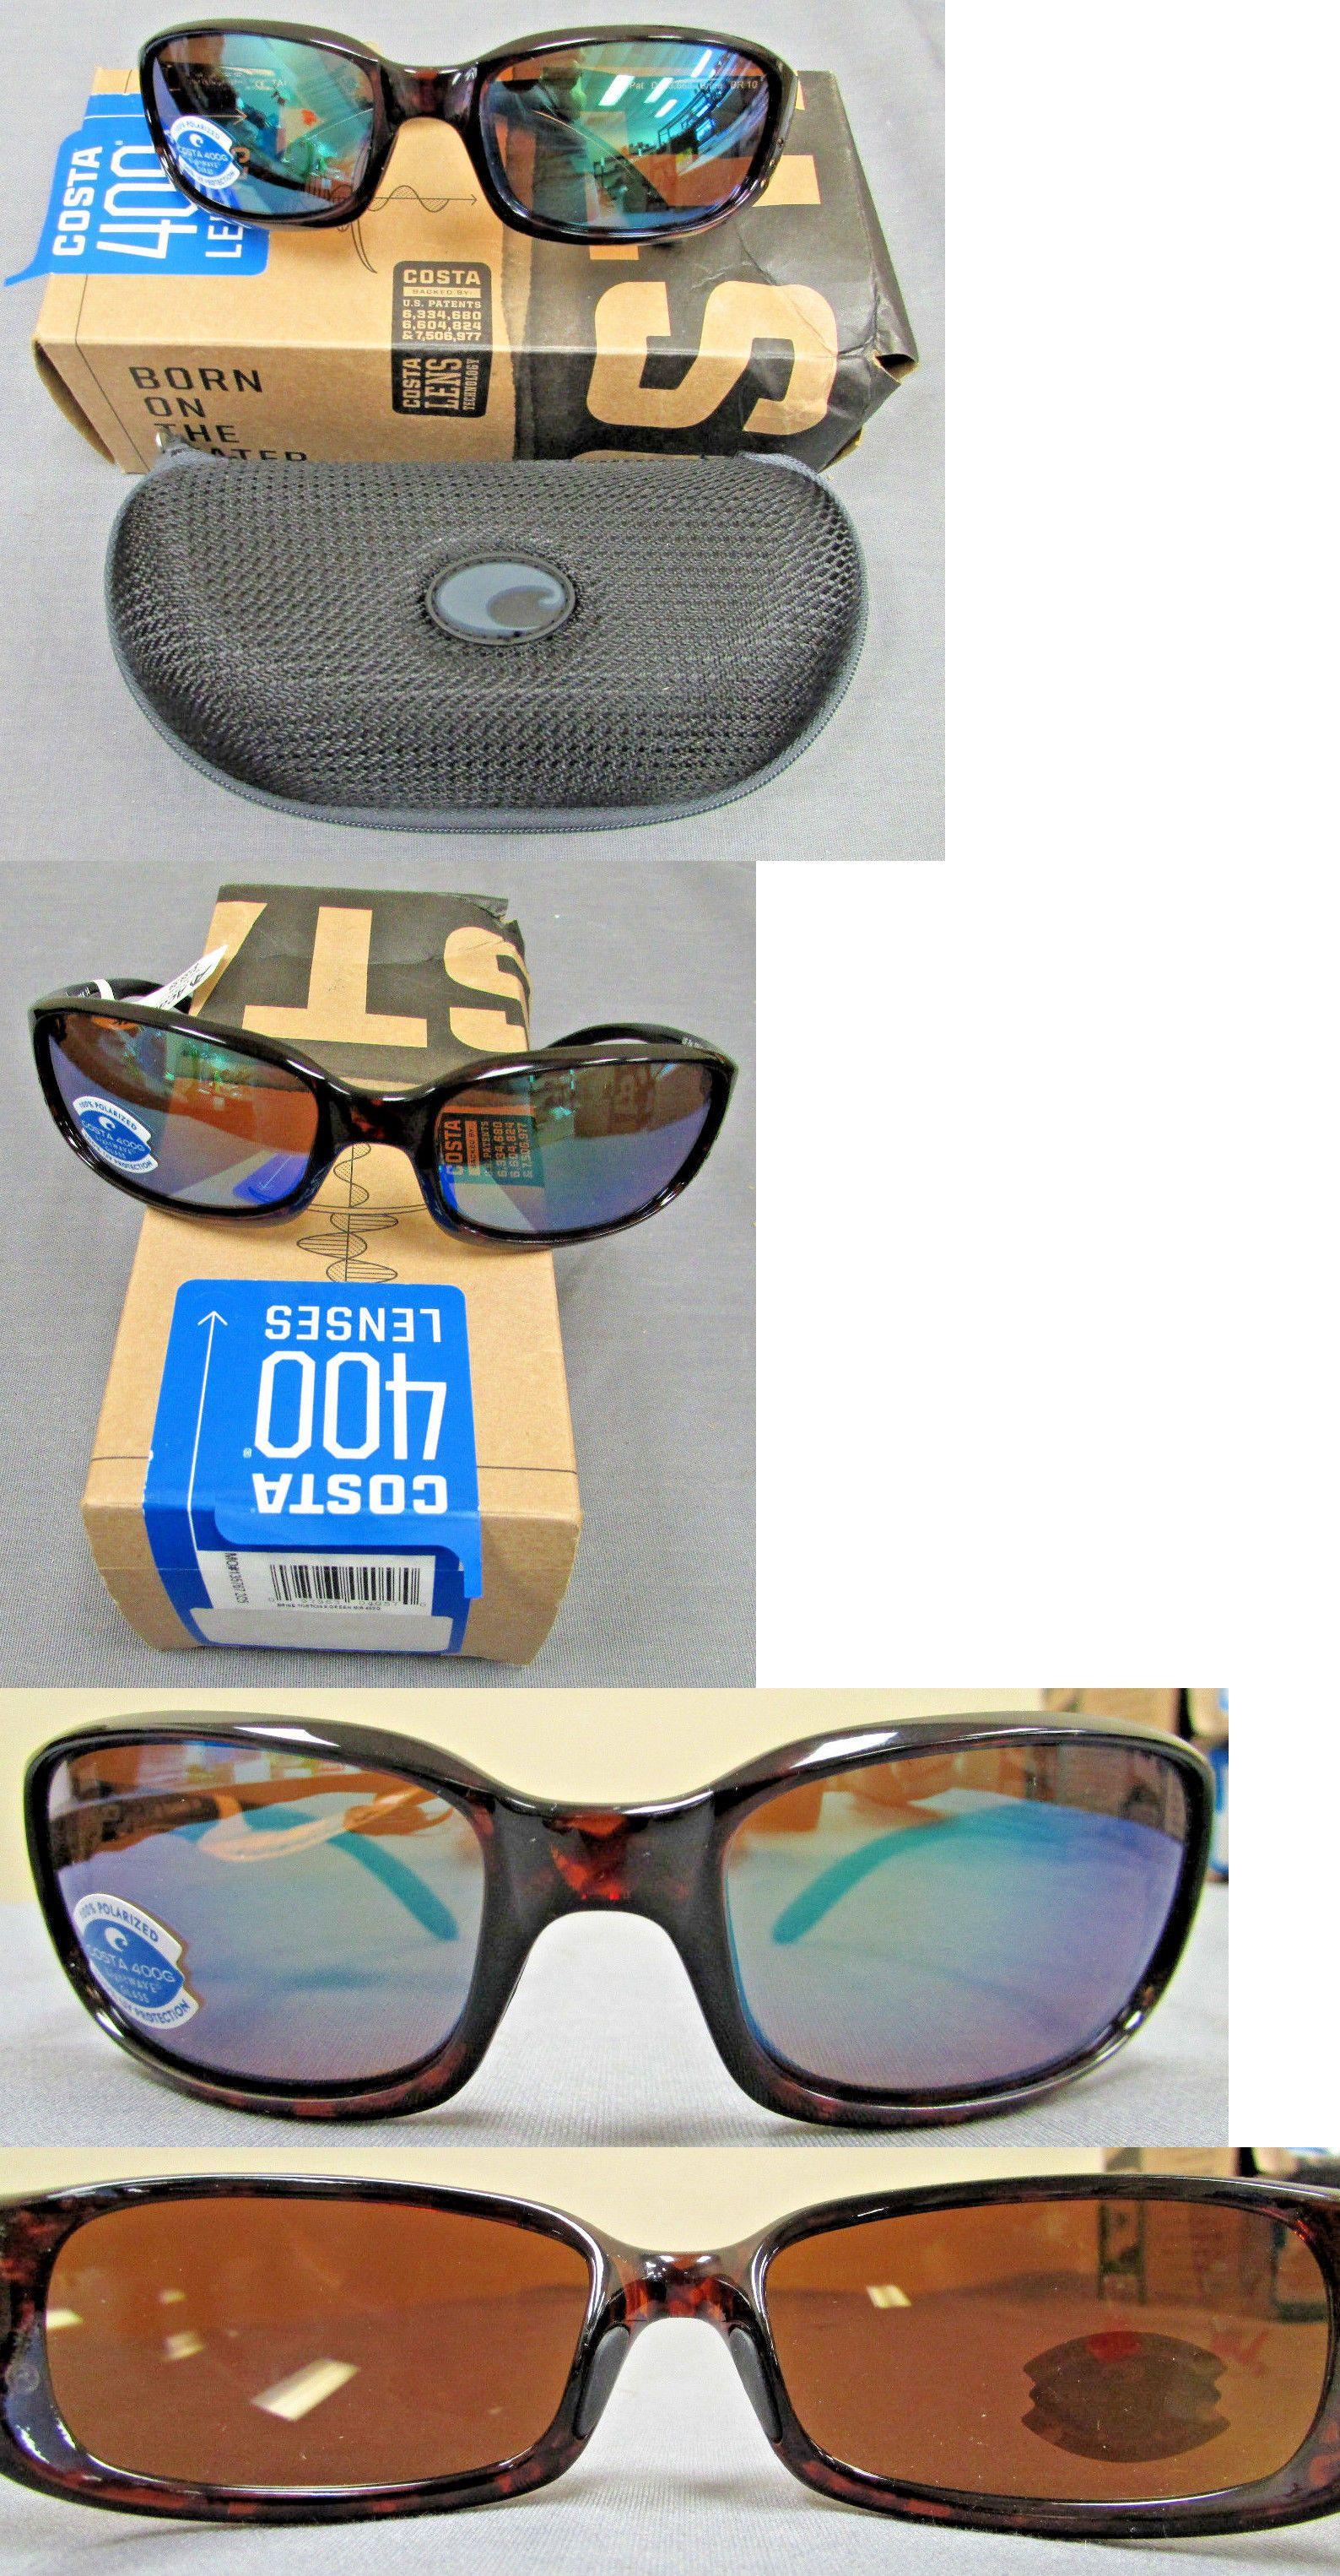 8b4b0a73e1d Sunglasses 151543  Costa Del Mar Brine Tortoise 400G Green Mirror -  BUY IT